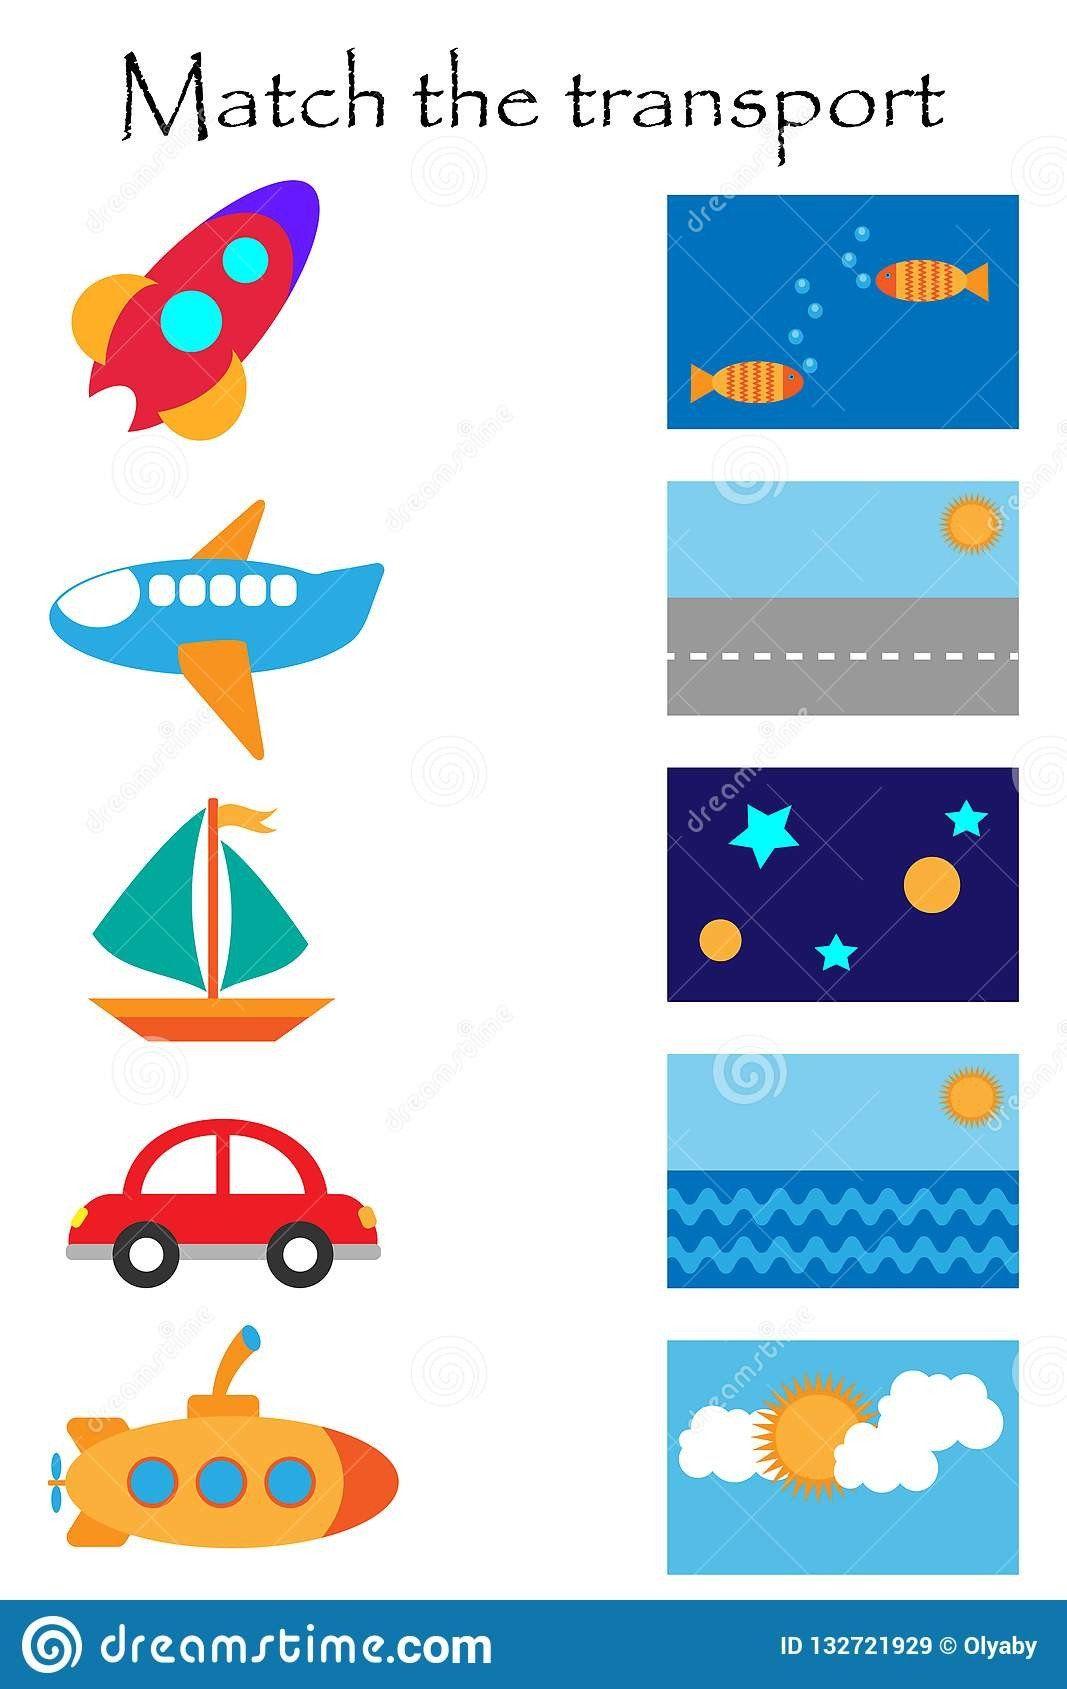 Transportation Worksheet For Preschool Match The Transport